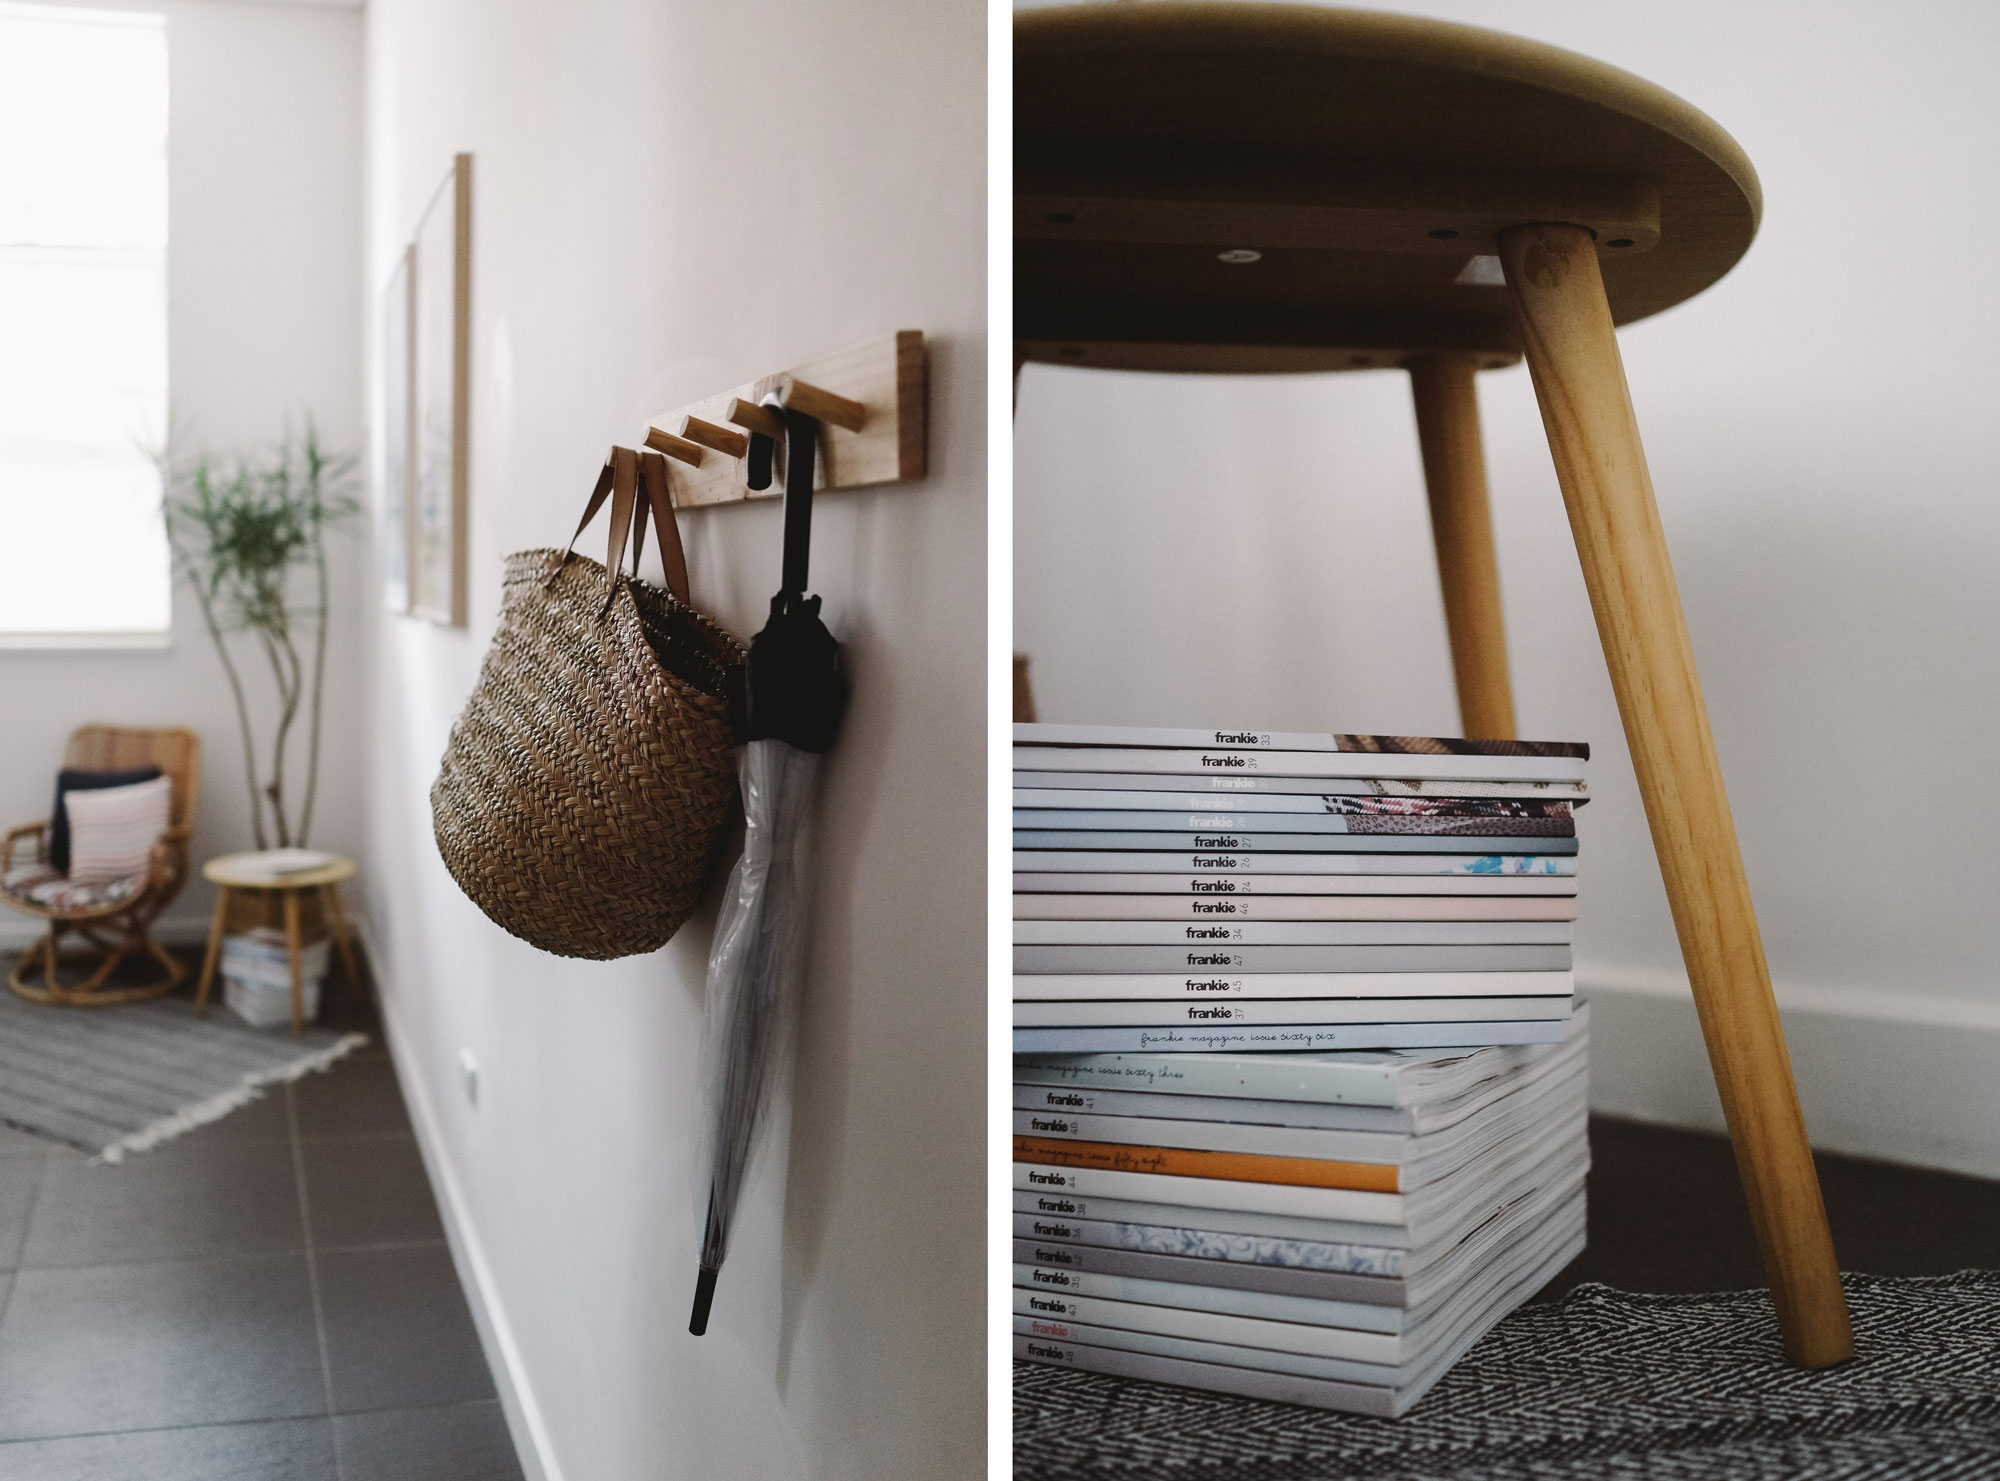 Newcastle-Airbnb-Jysla-Kay-2.jpg